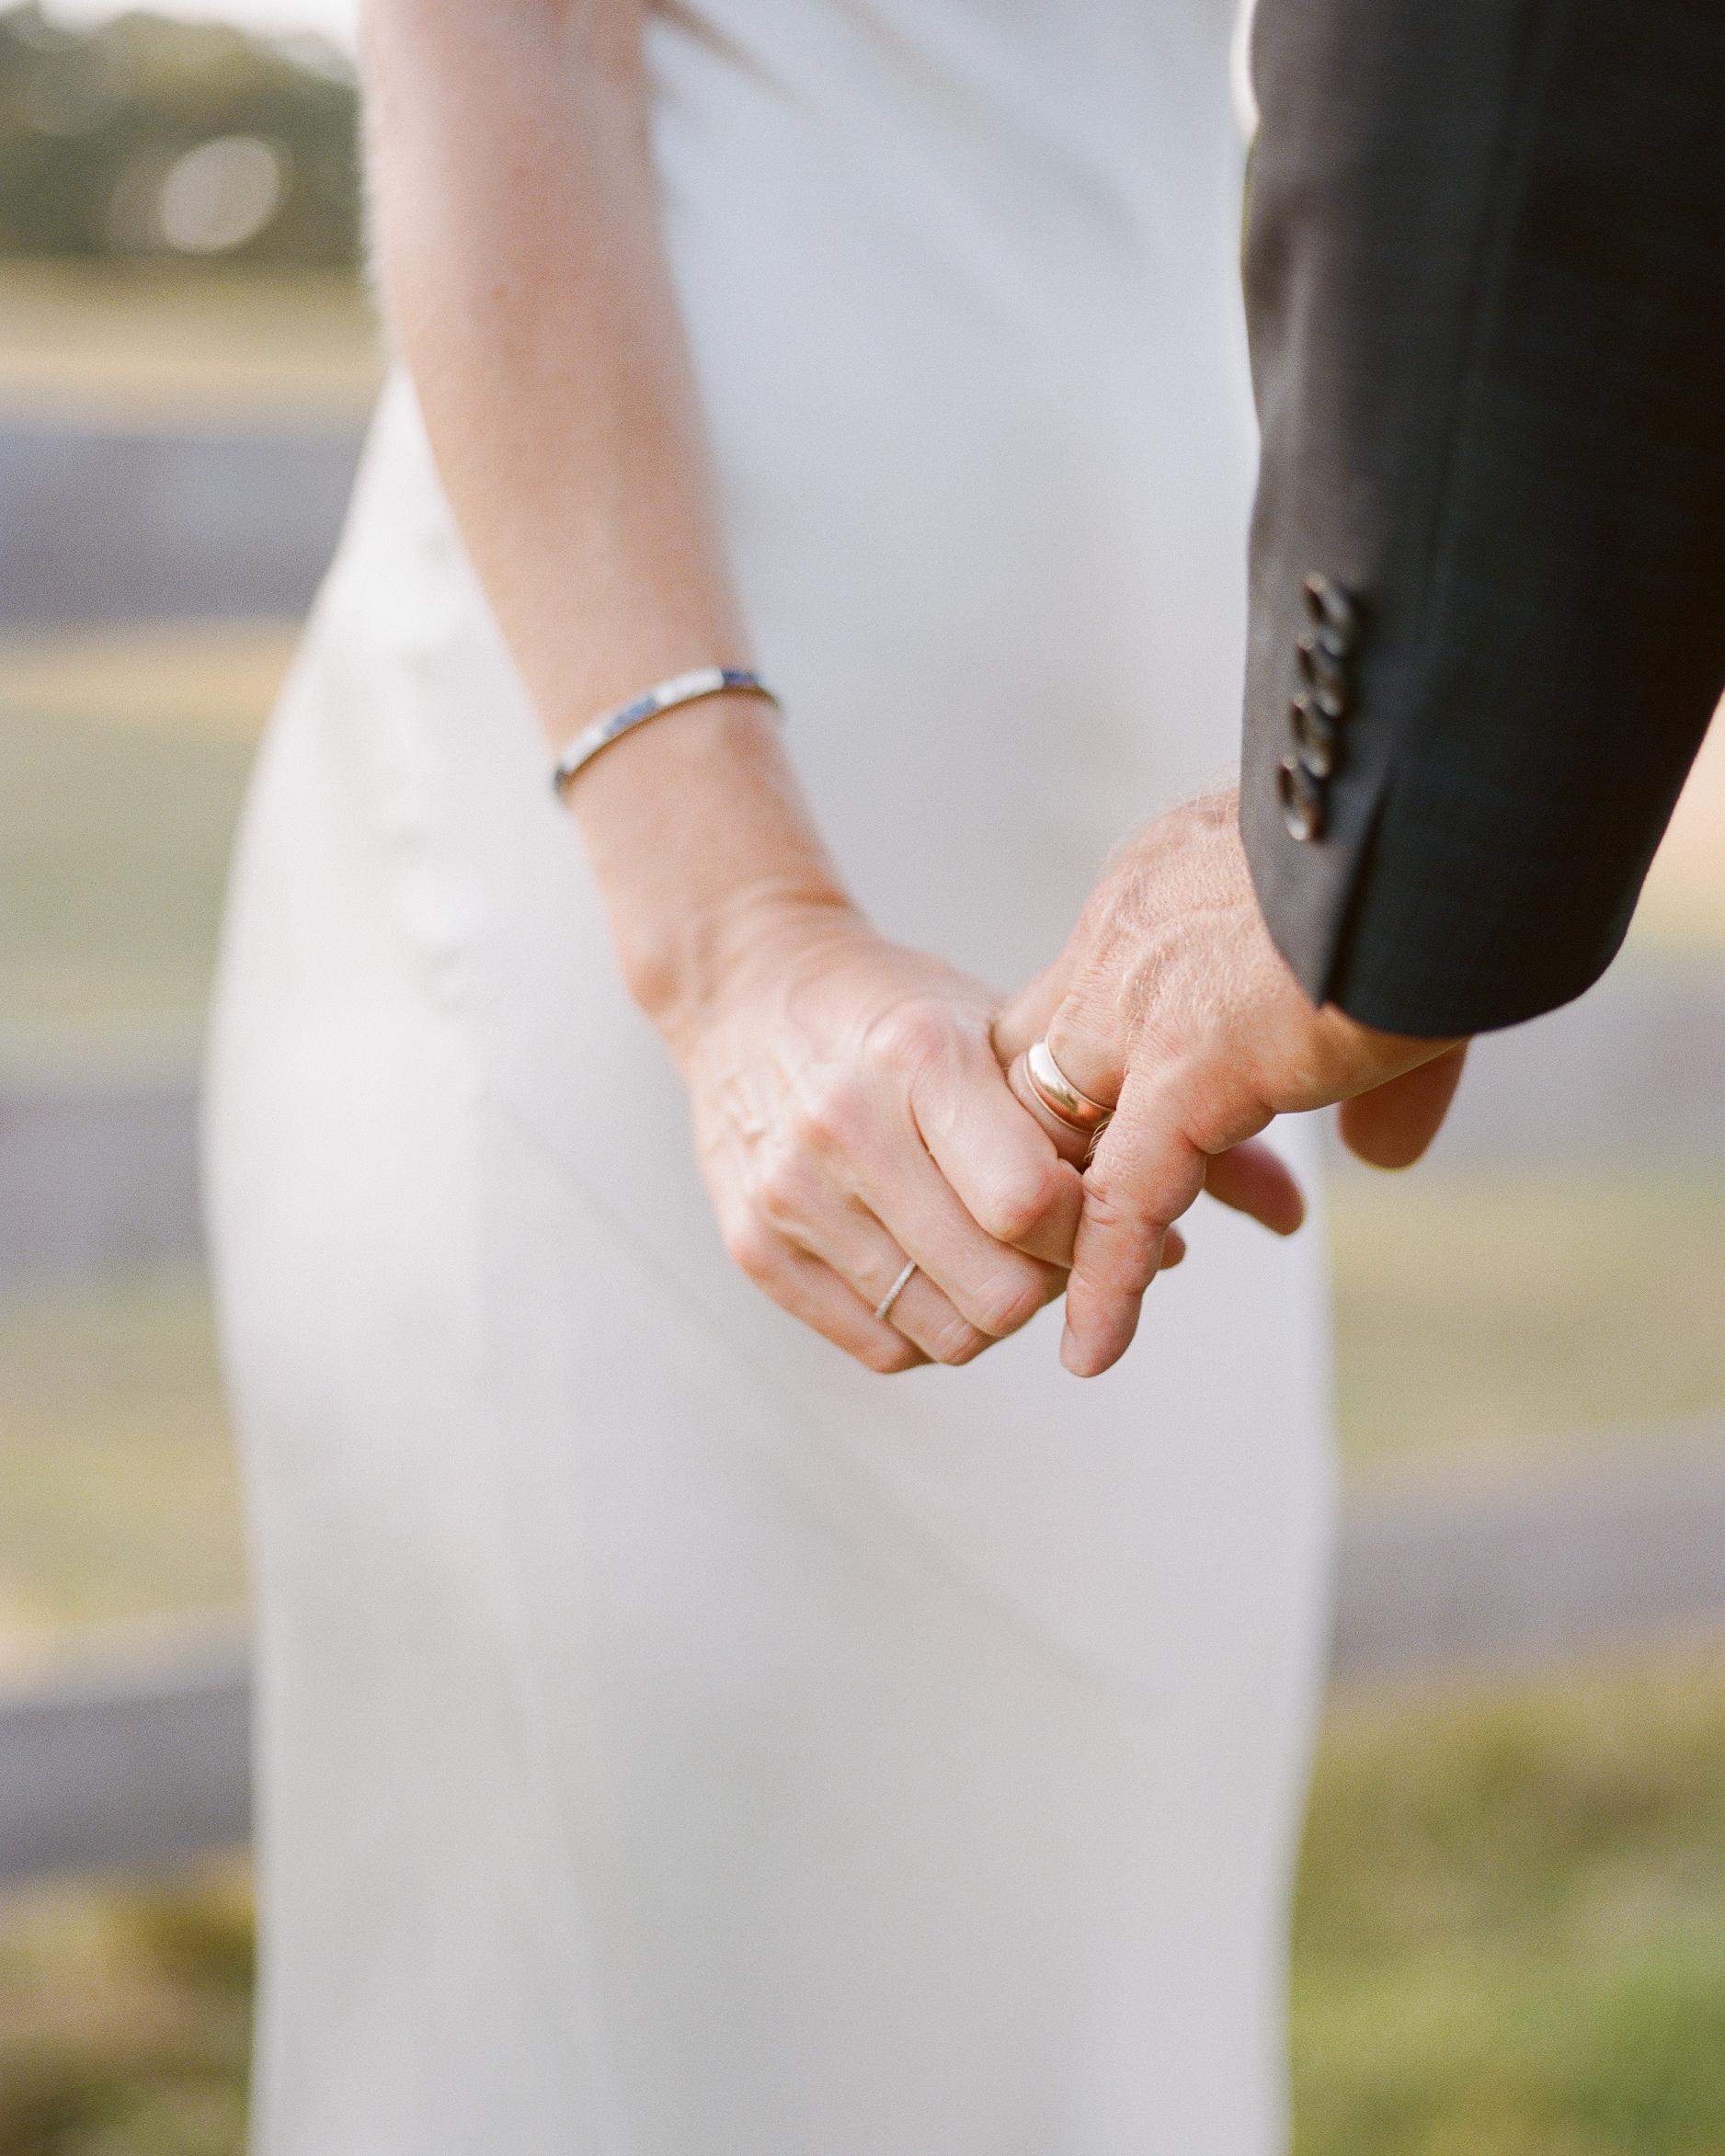 jocelyn-graham-wedding-hands-1150-s111847-0315.jpg